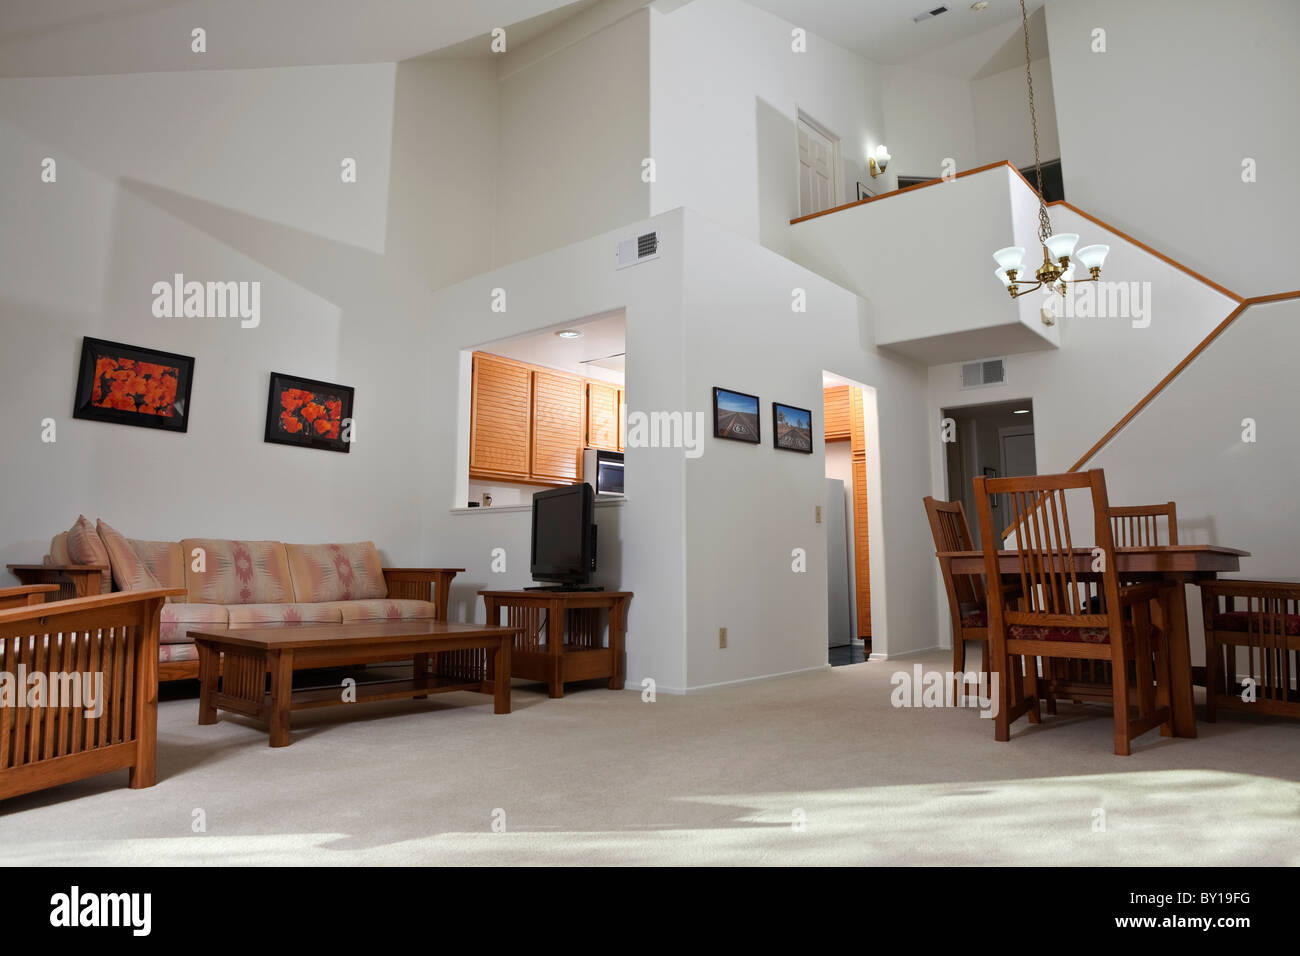 Sunny California Townhouse Style Condo Living Room The Wall